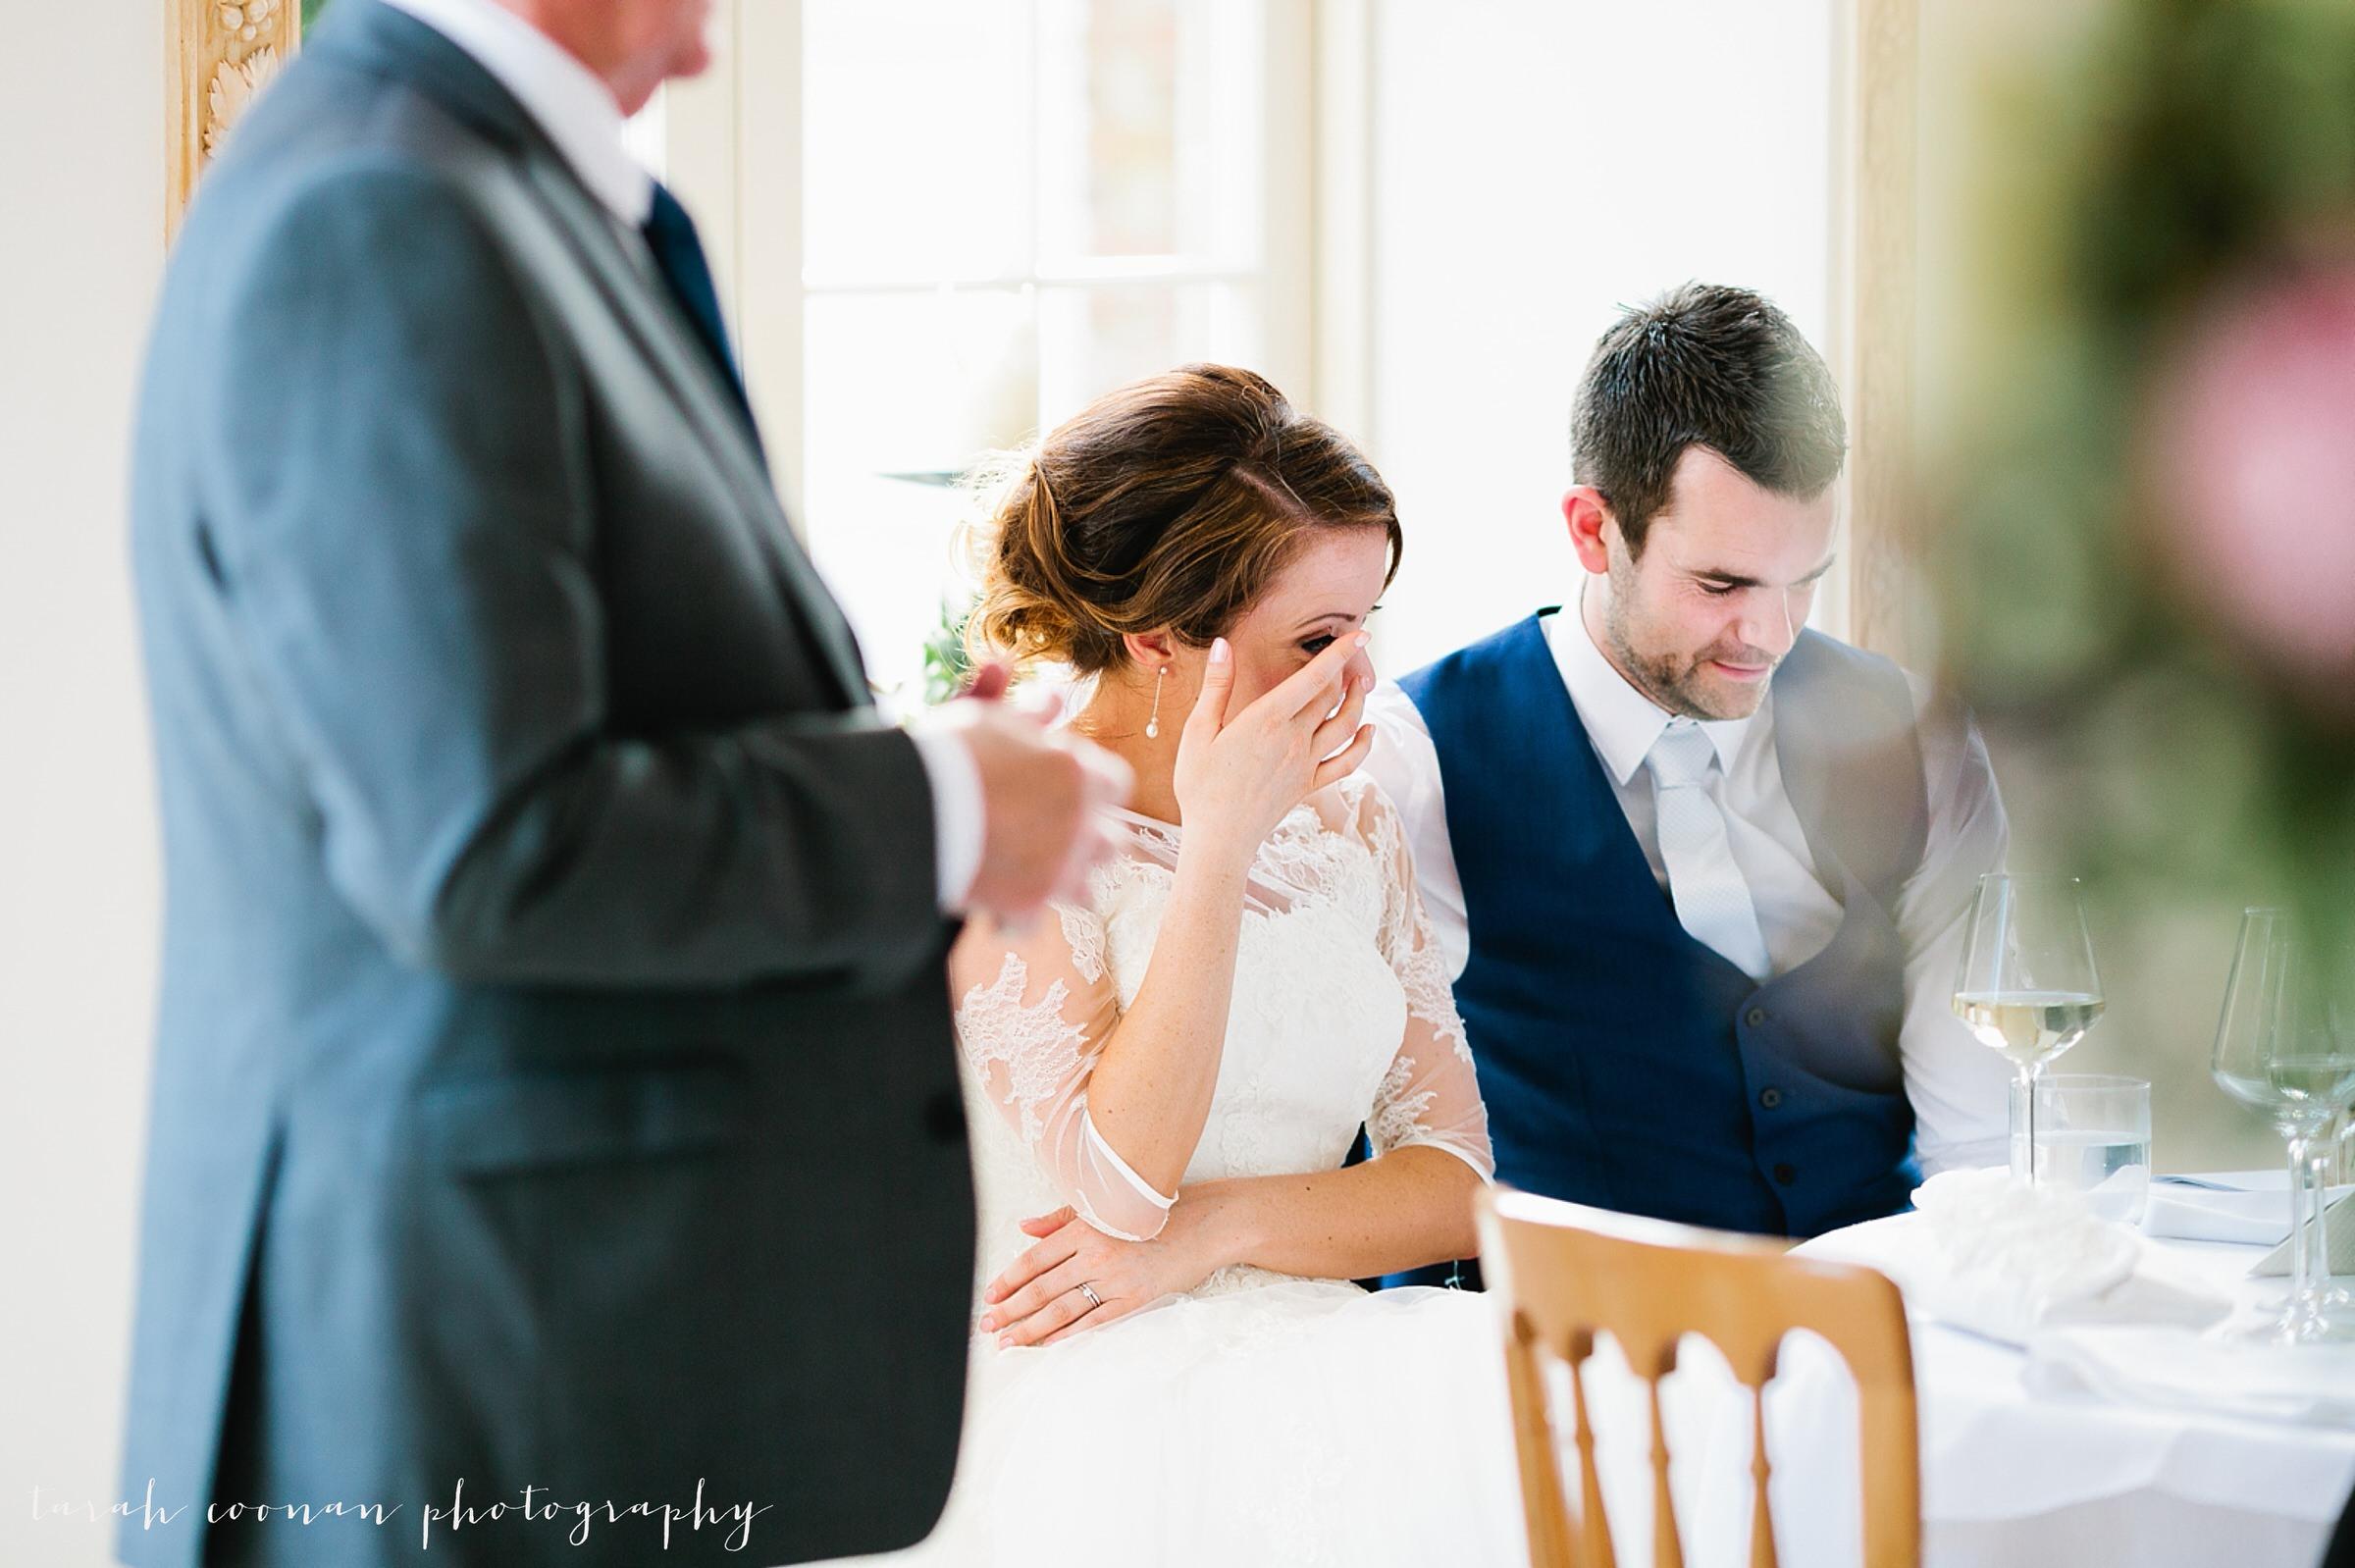 northbrook-park-wedding-photographer_072